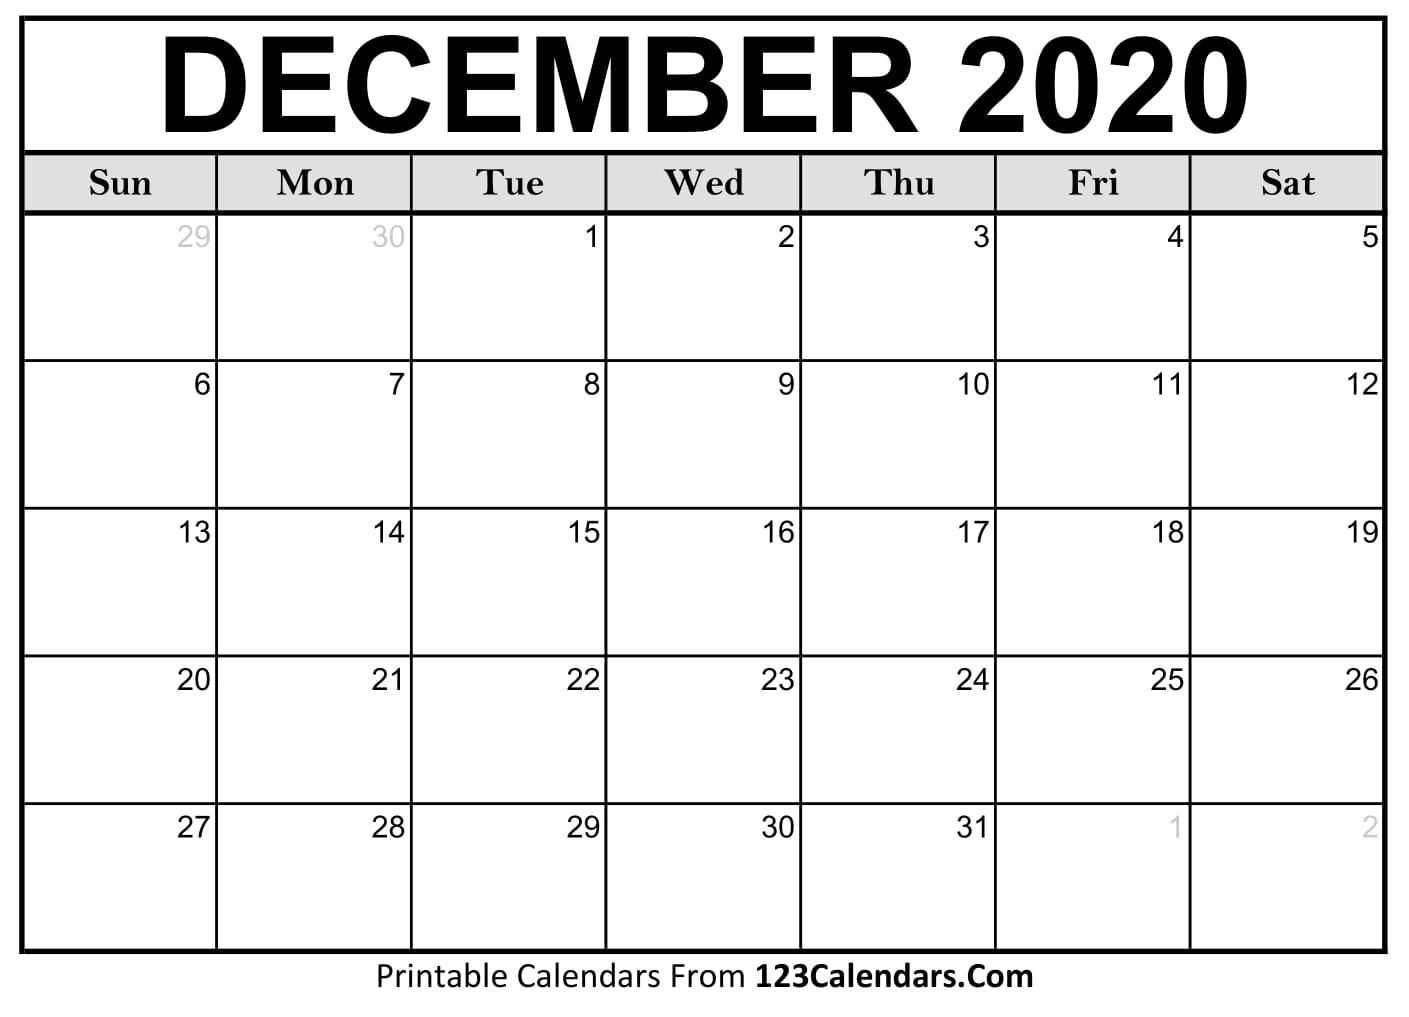 Printable December 2020 Calendar Templates | 123Calendars